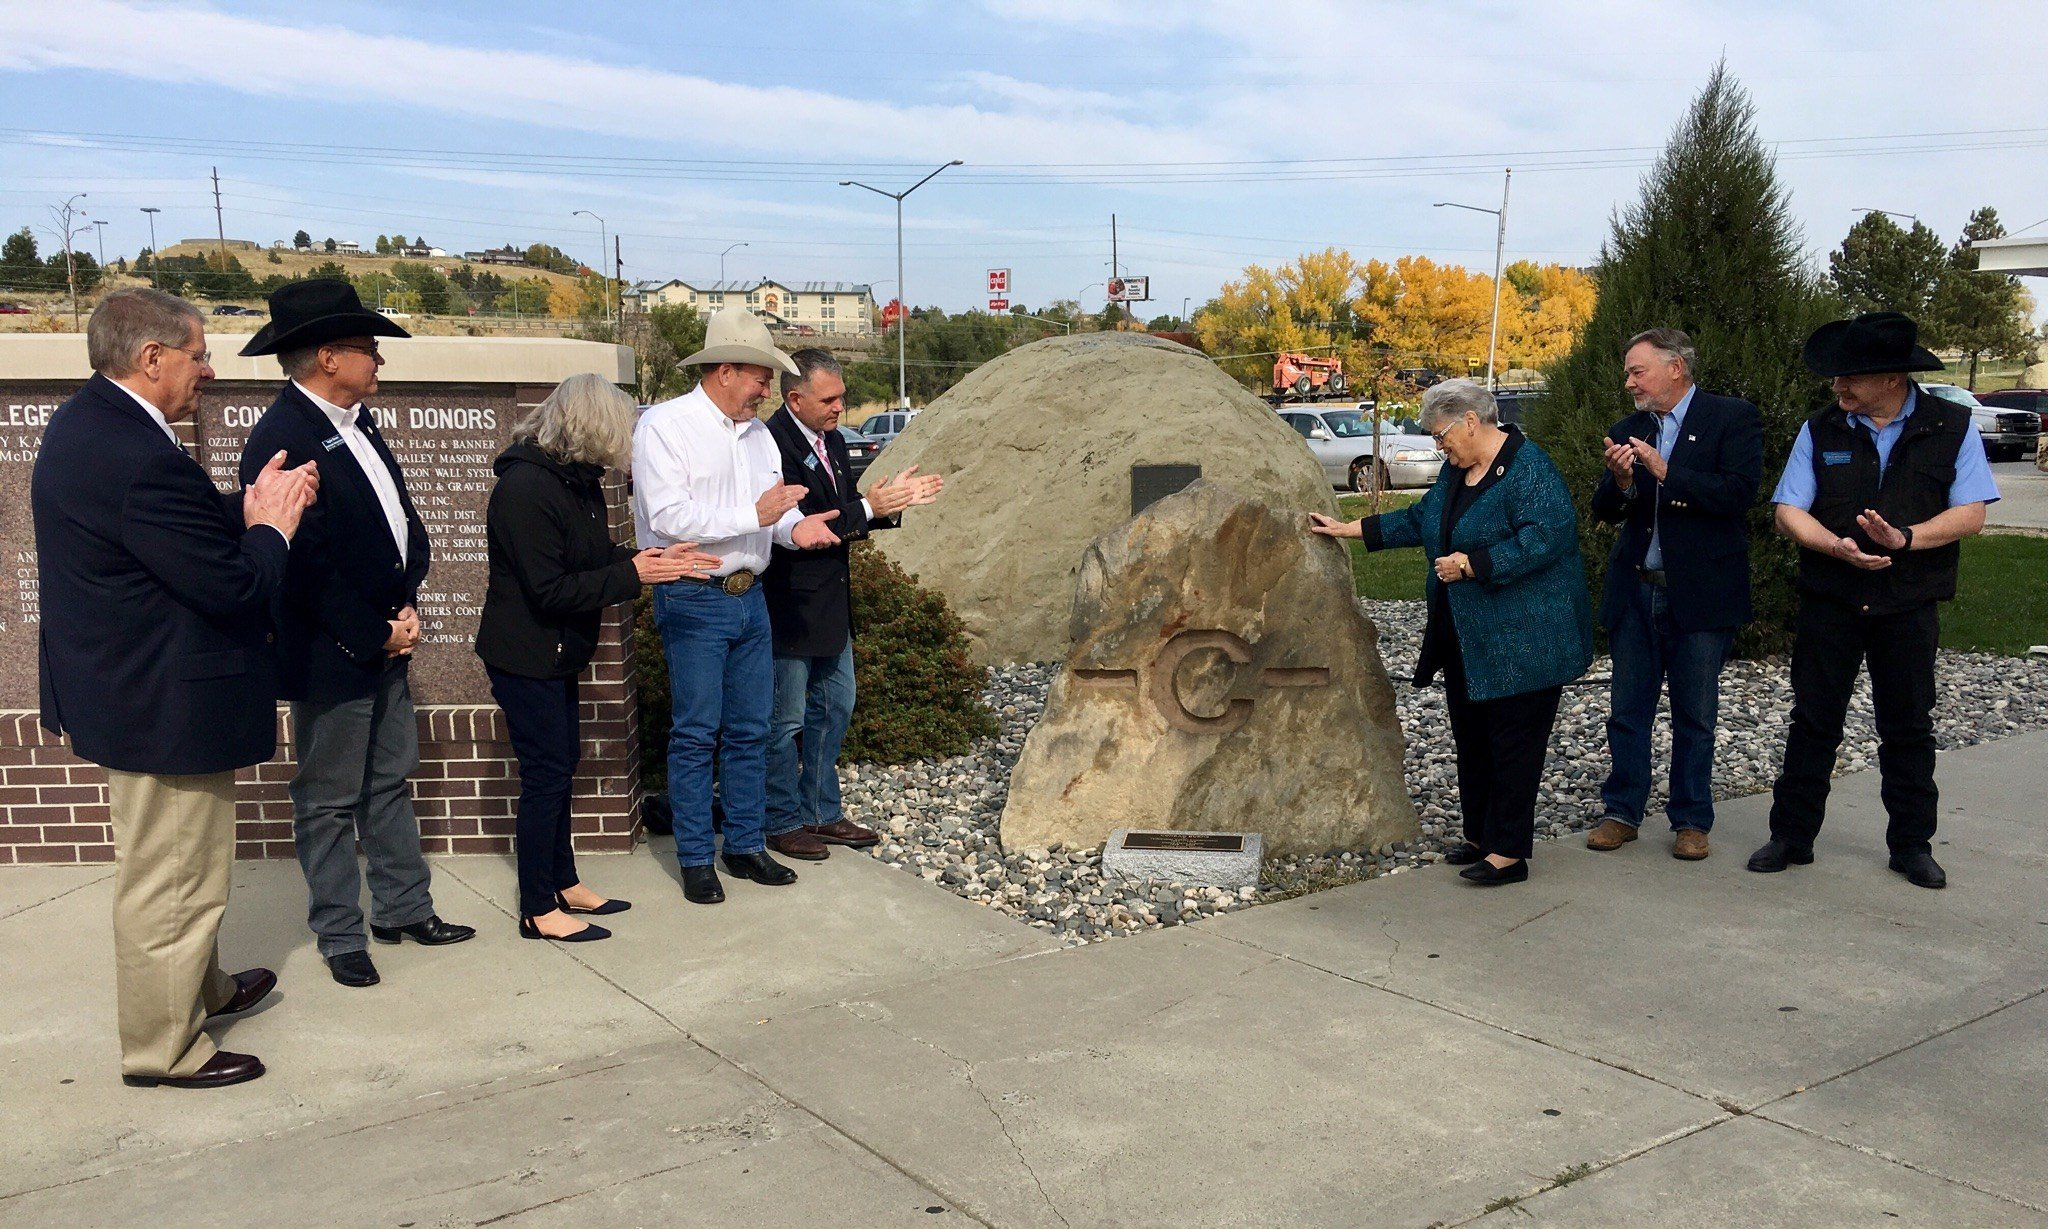 The rock has the brand Conrad Burns used for livestock. (MTN News Photo)